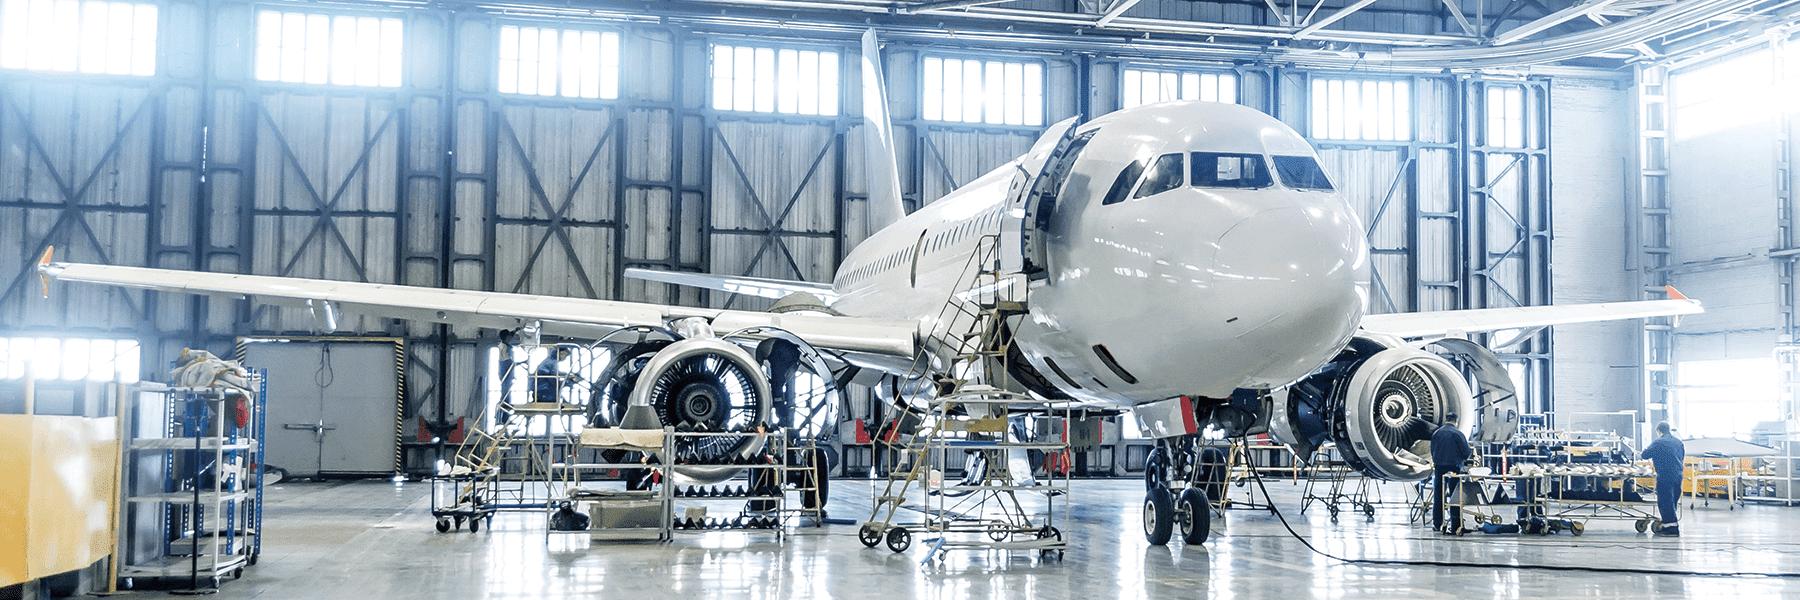 Real Time Energy Monitoring at Airplane Hangar